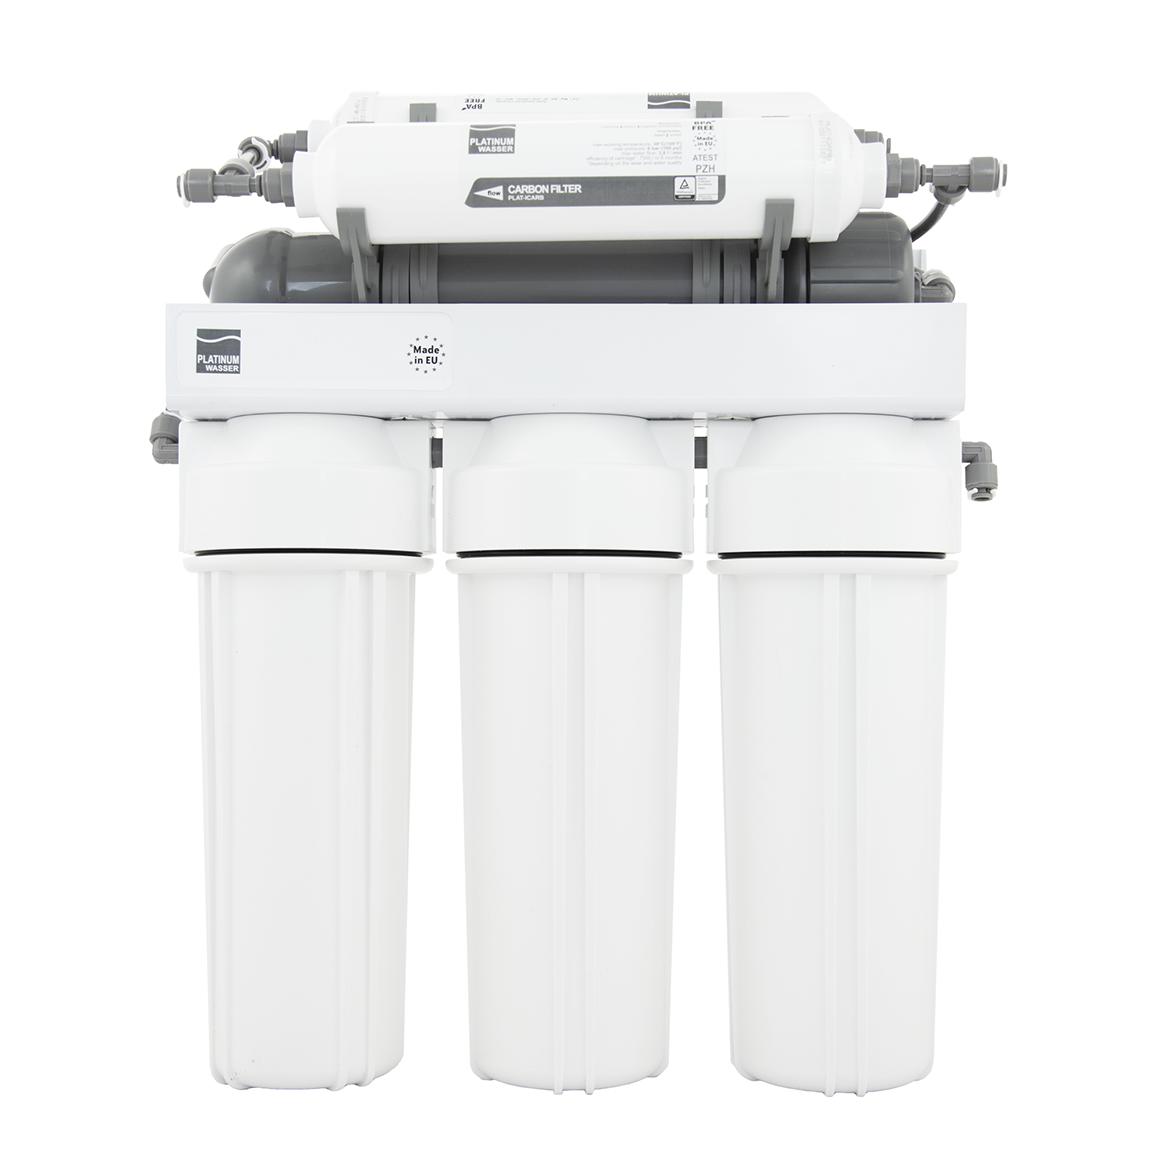 Platinum Wasser Ultra 6P, система обратного осмоса с насосом и минерализатором (RO6P PLAT-F-ULTRA6B)